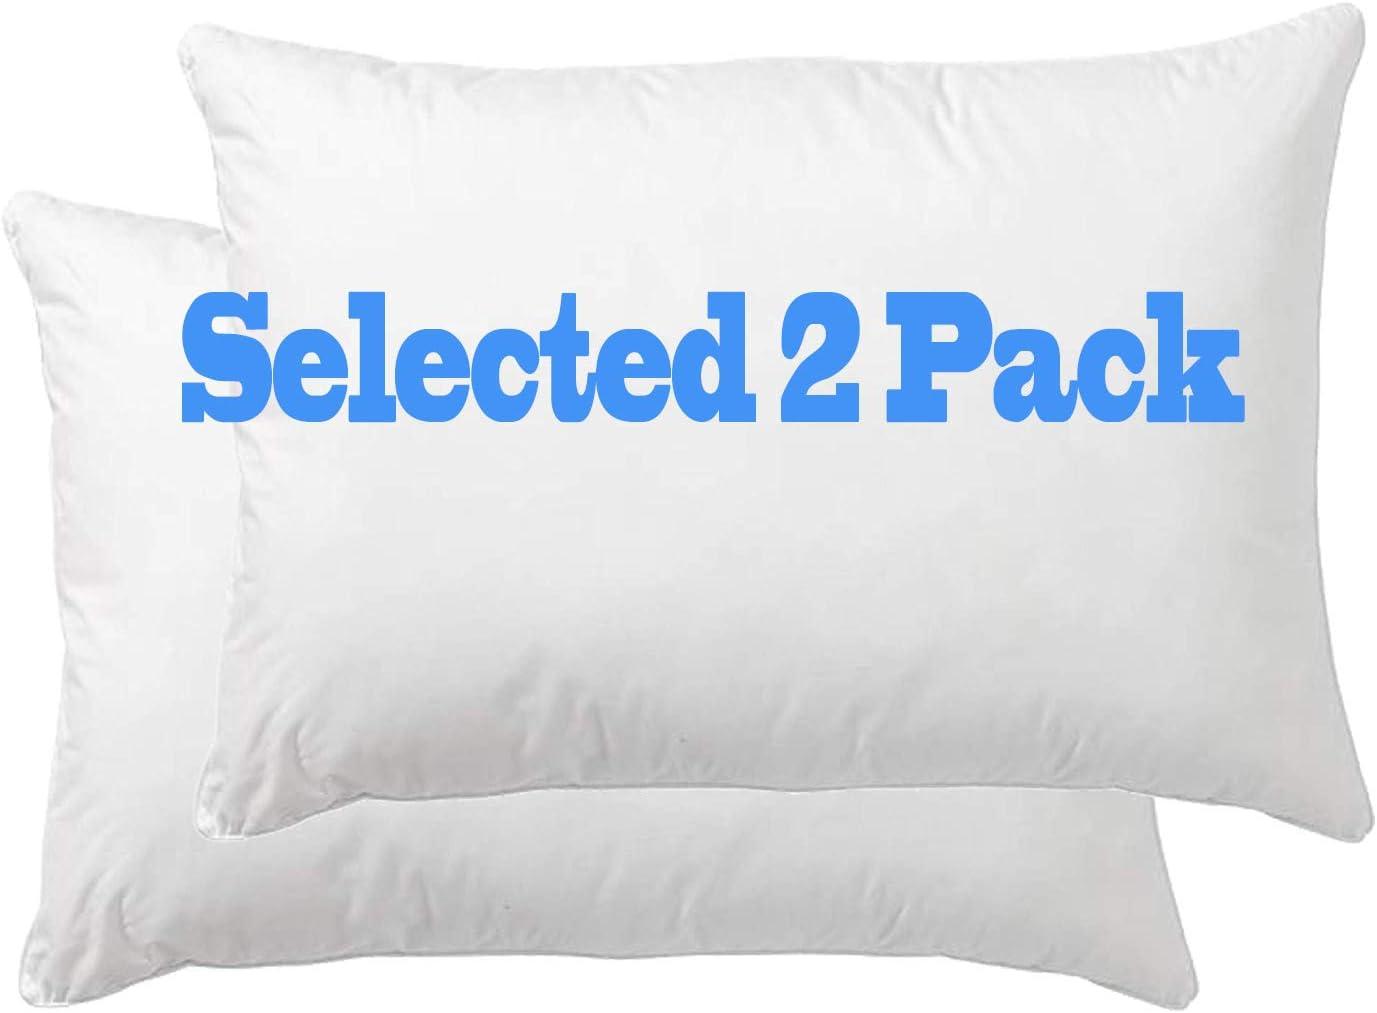 Danmitex Oblong Throw Pillow 国内正規総代理店アイテム Insert Stuffer Decorative お買得